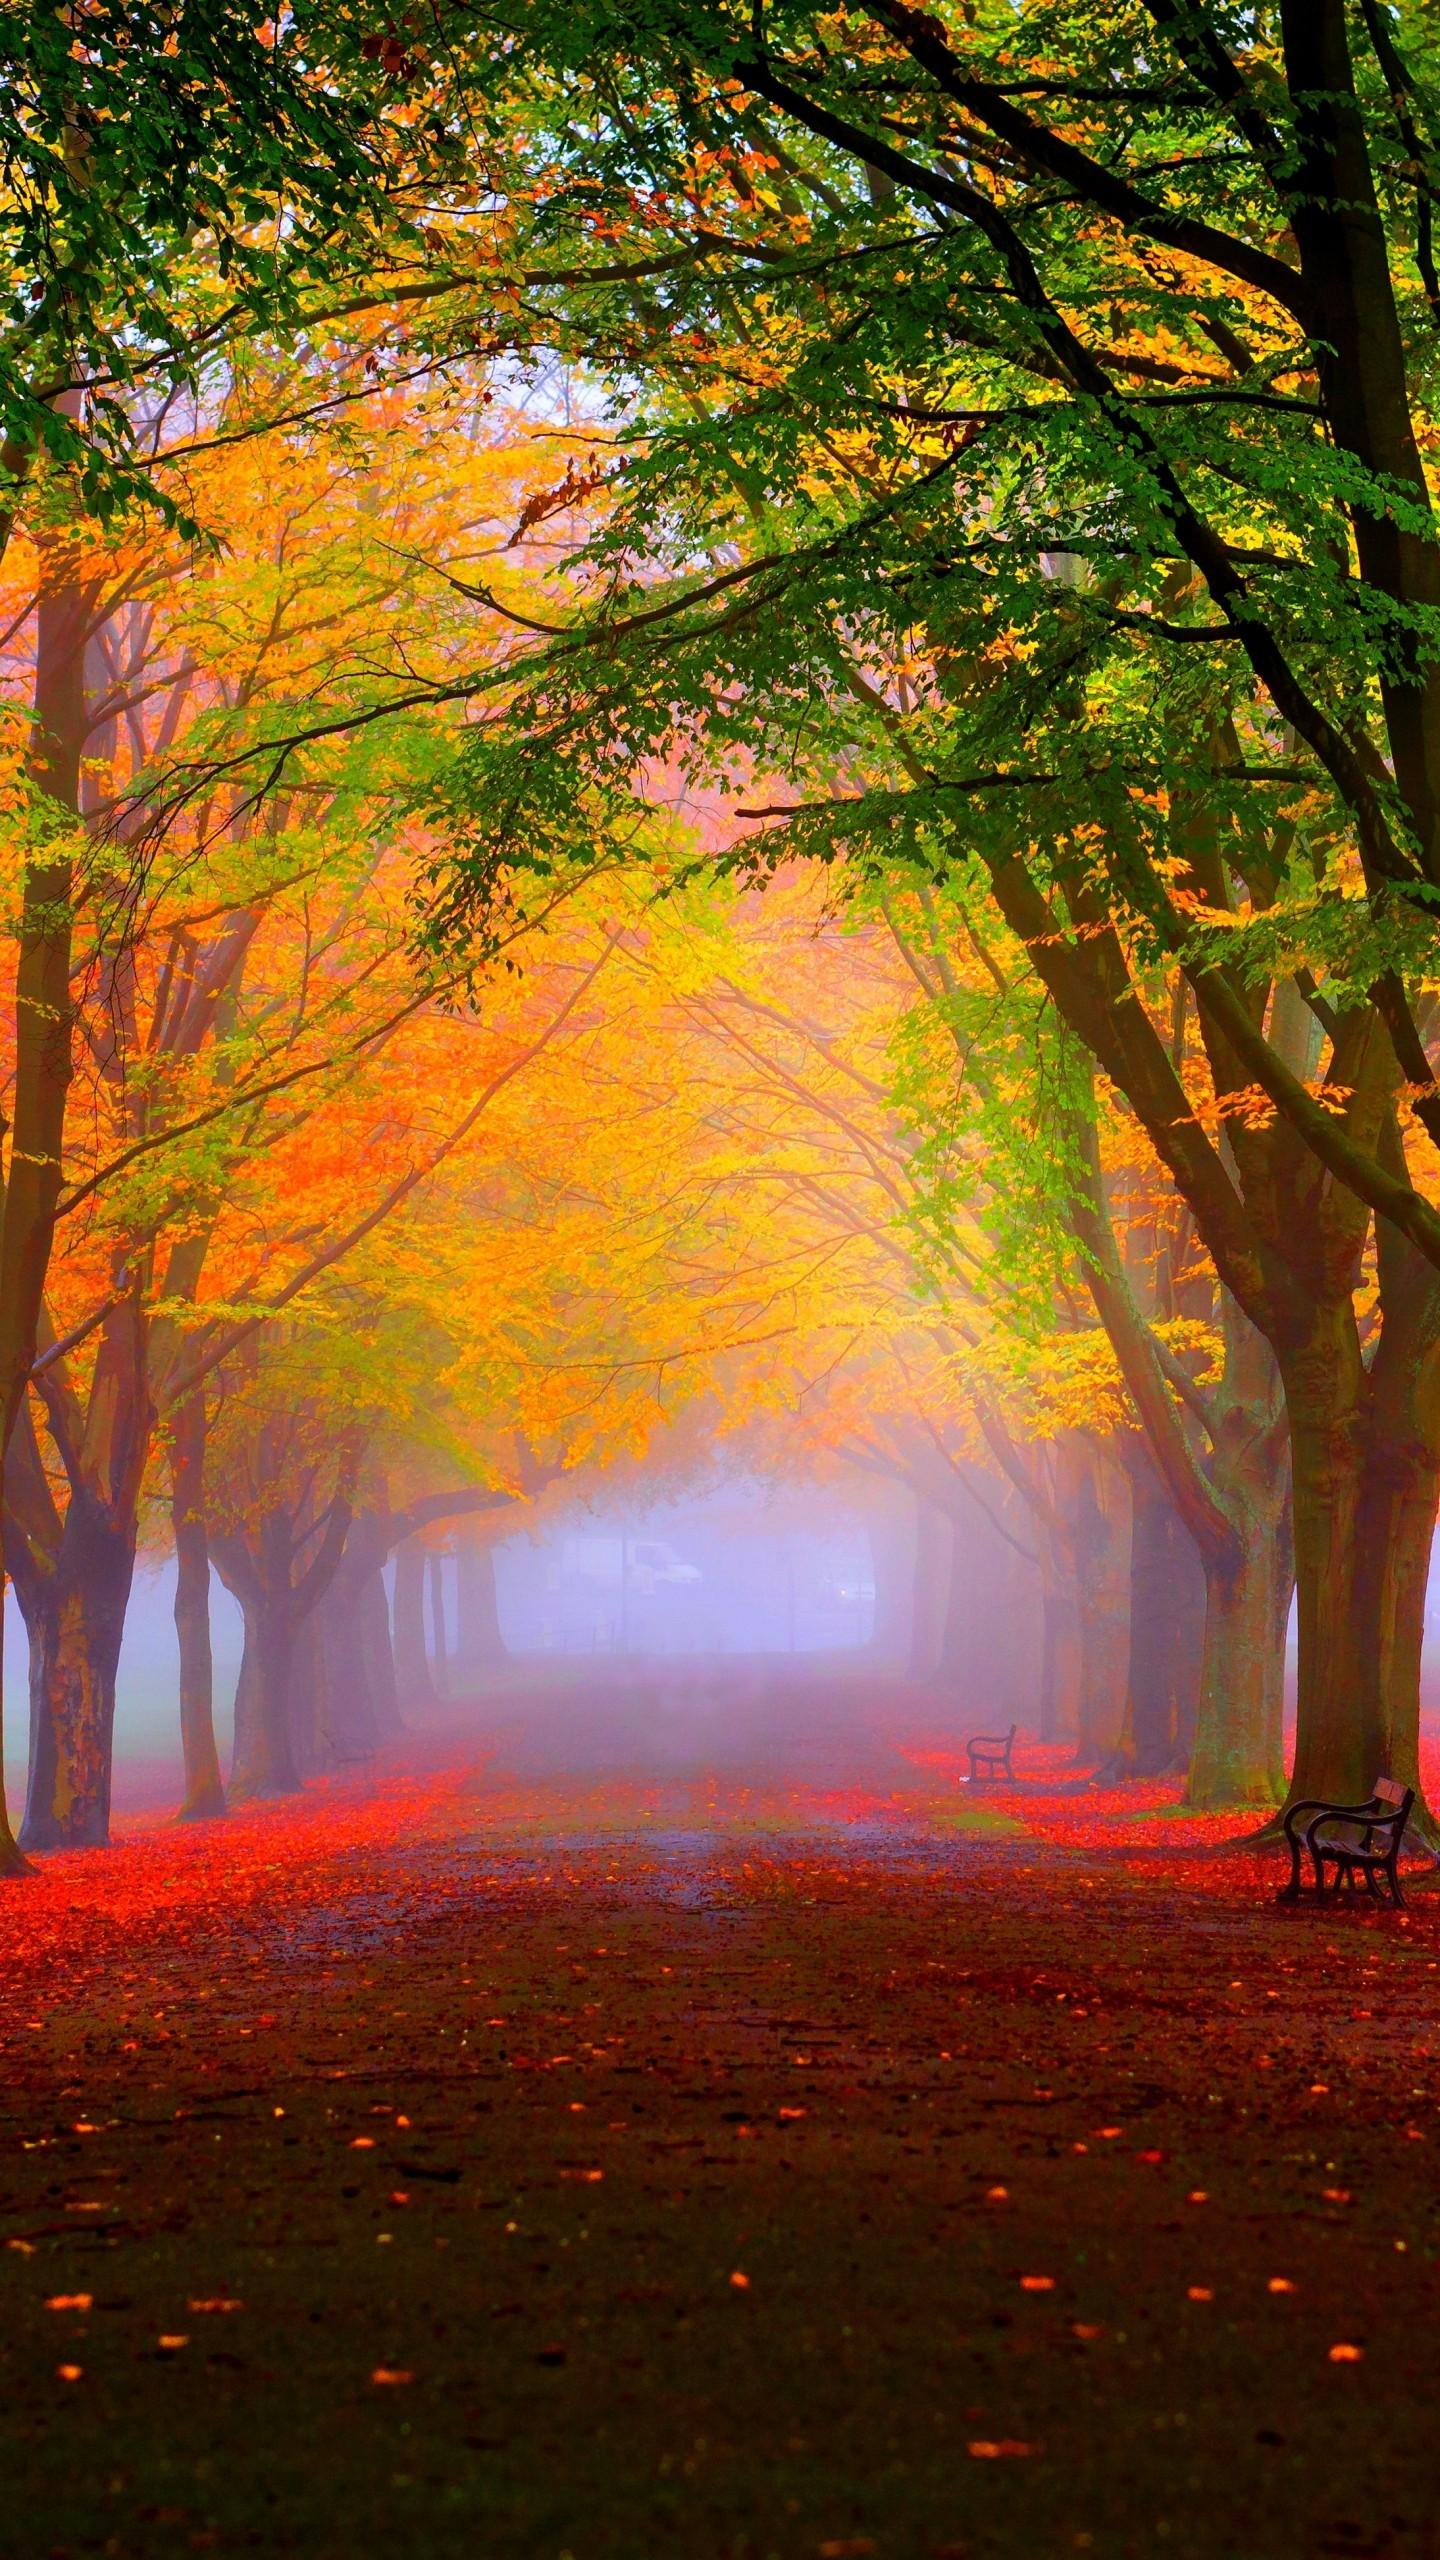 Wallpaper Park, 5k, 4k Wallpaper, 8k, Autumn, Beautiful